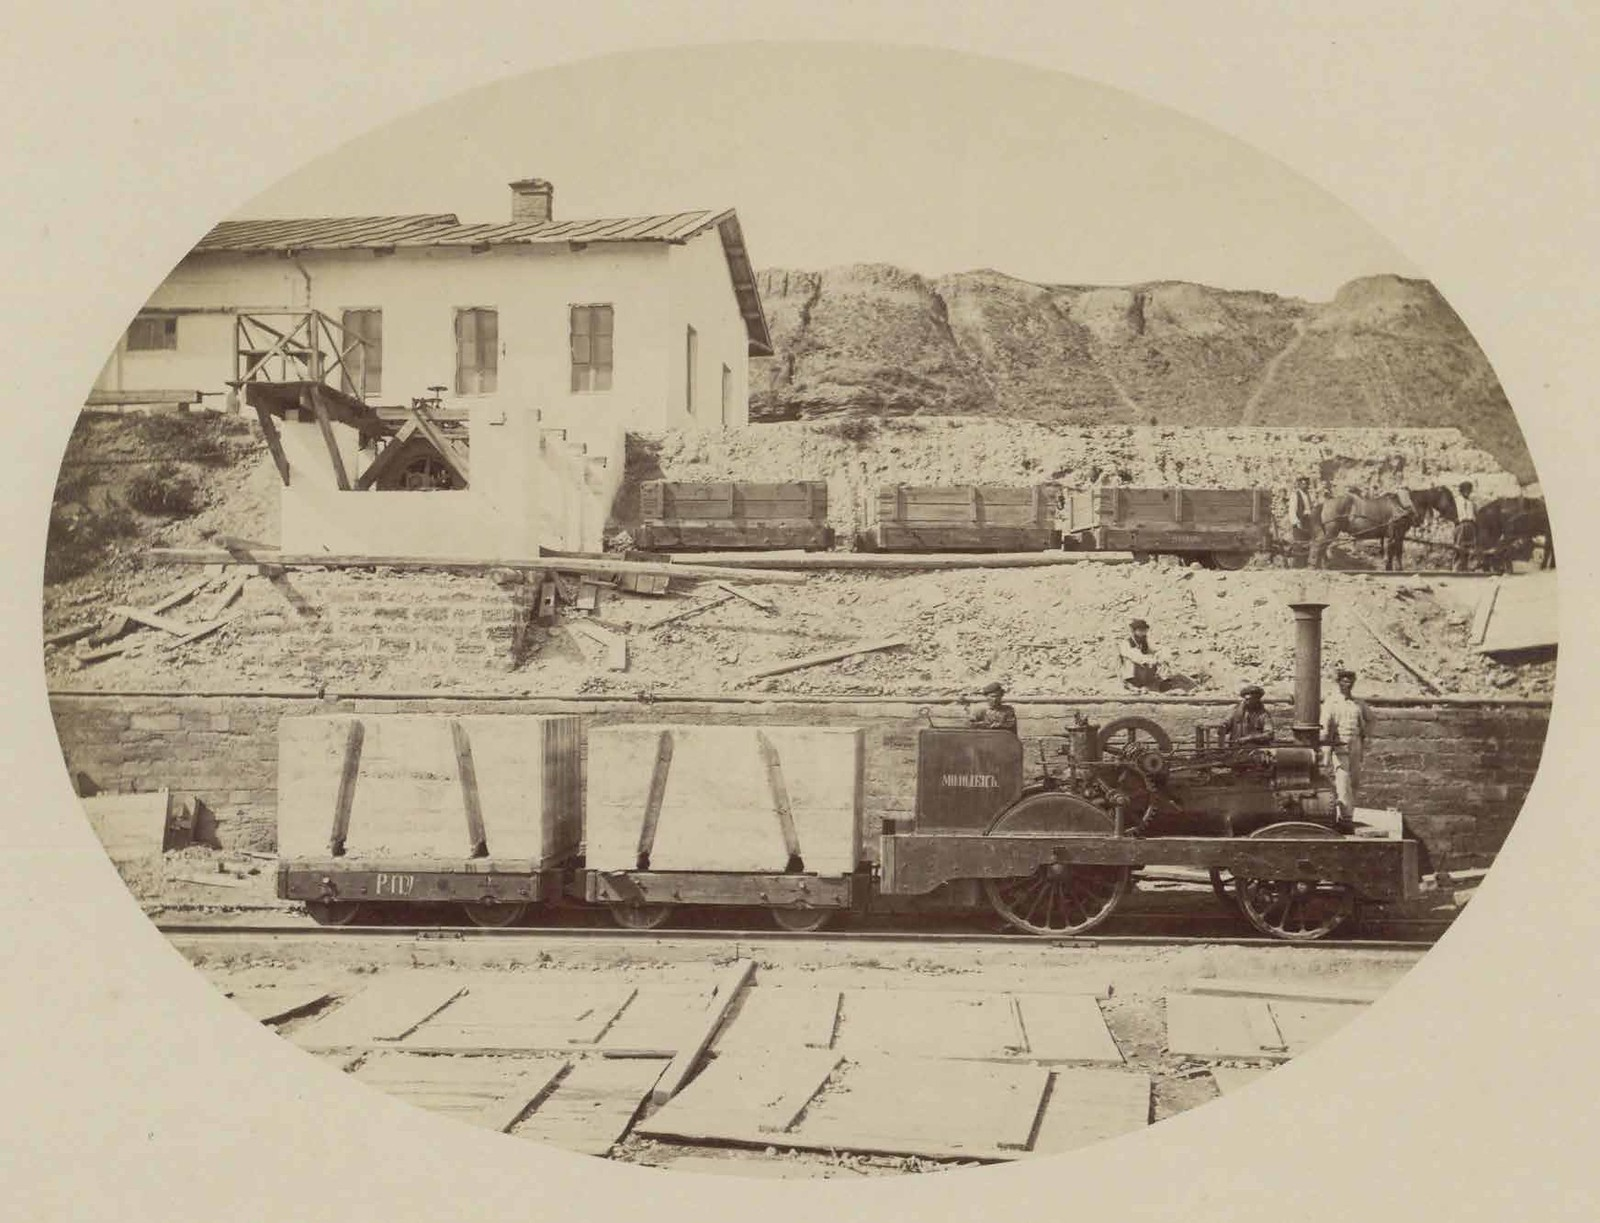 Паровоз «Молодец» и две вагонетки